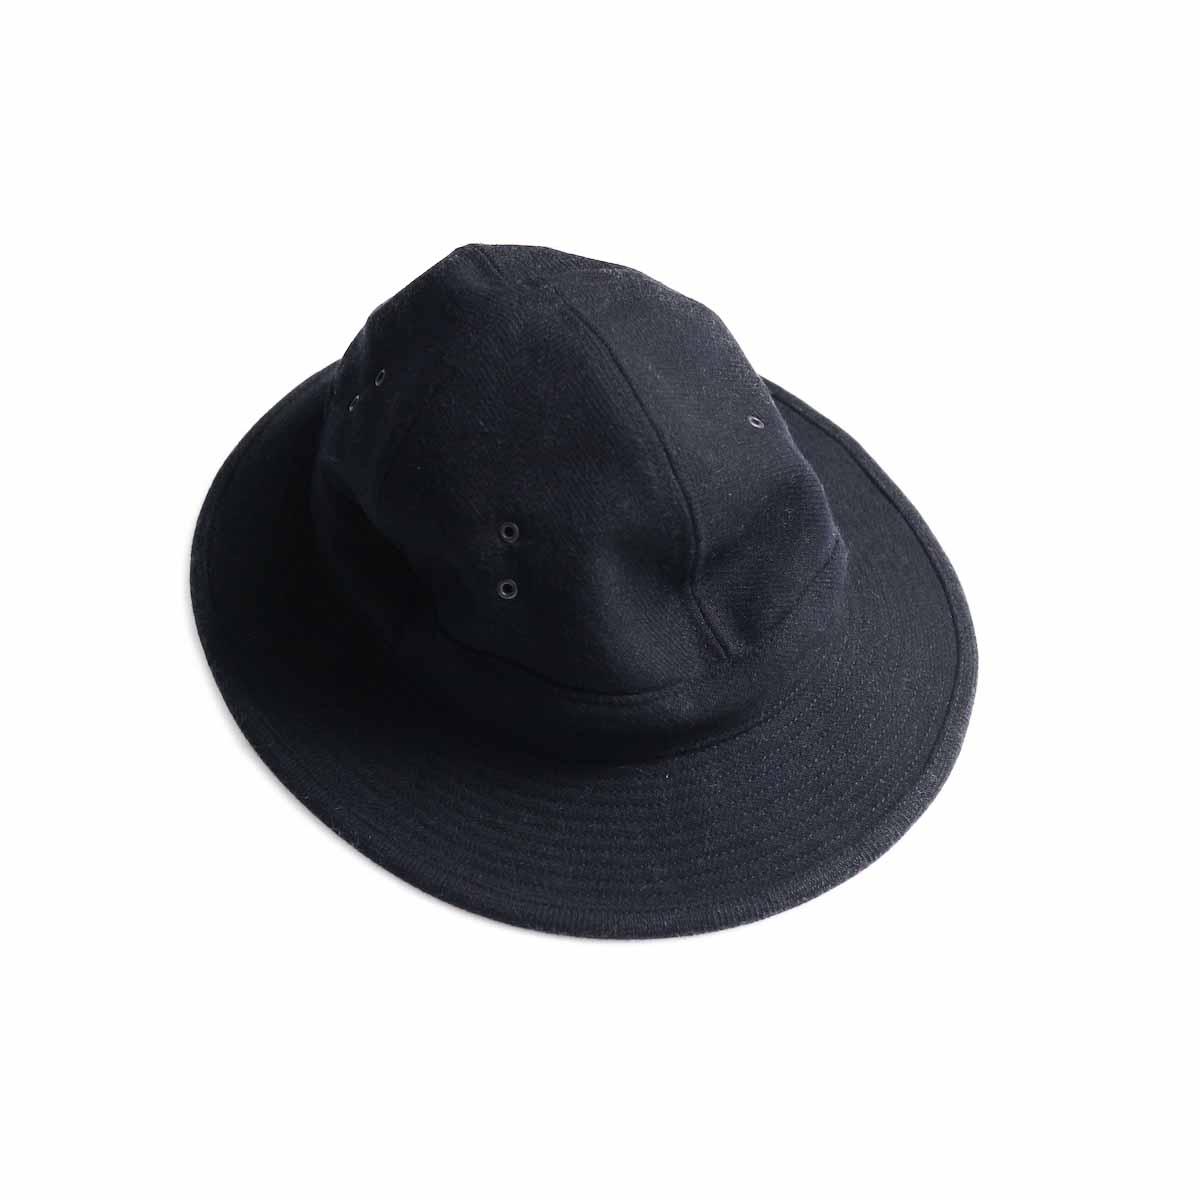 orSlow / US Navy Hat -Melton Wool Herringbone Twill(BLACK)